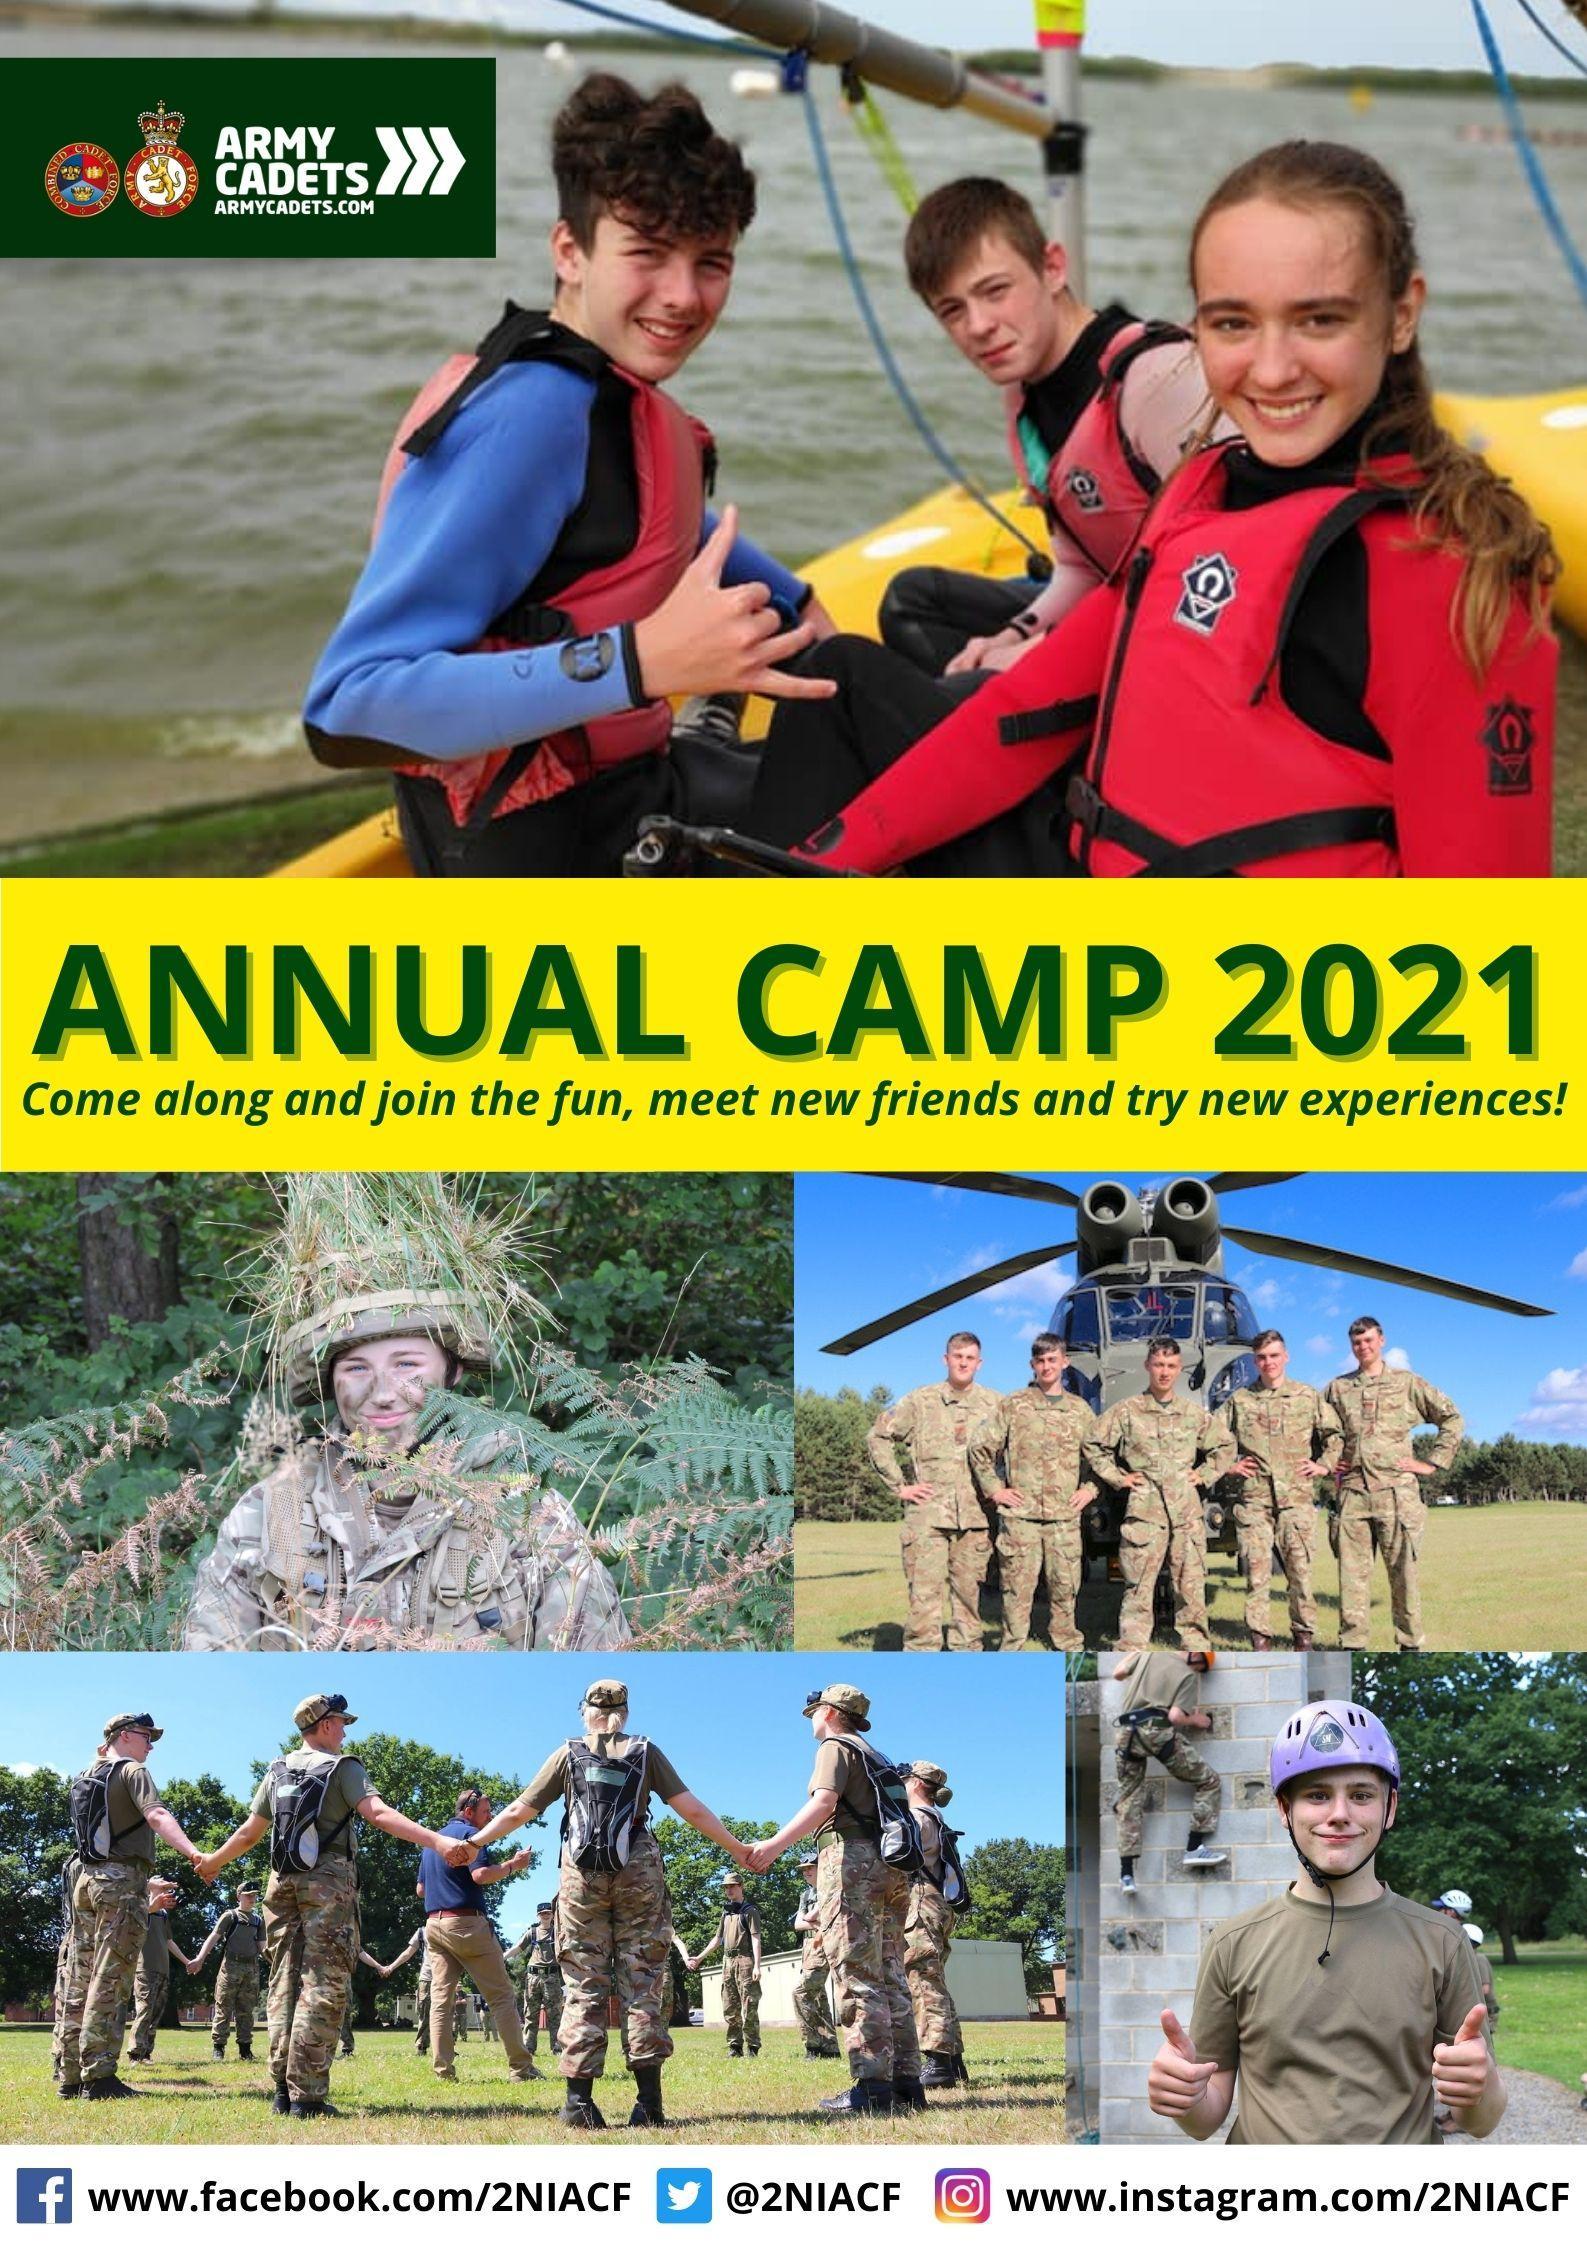 Annual Camp 2021